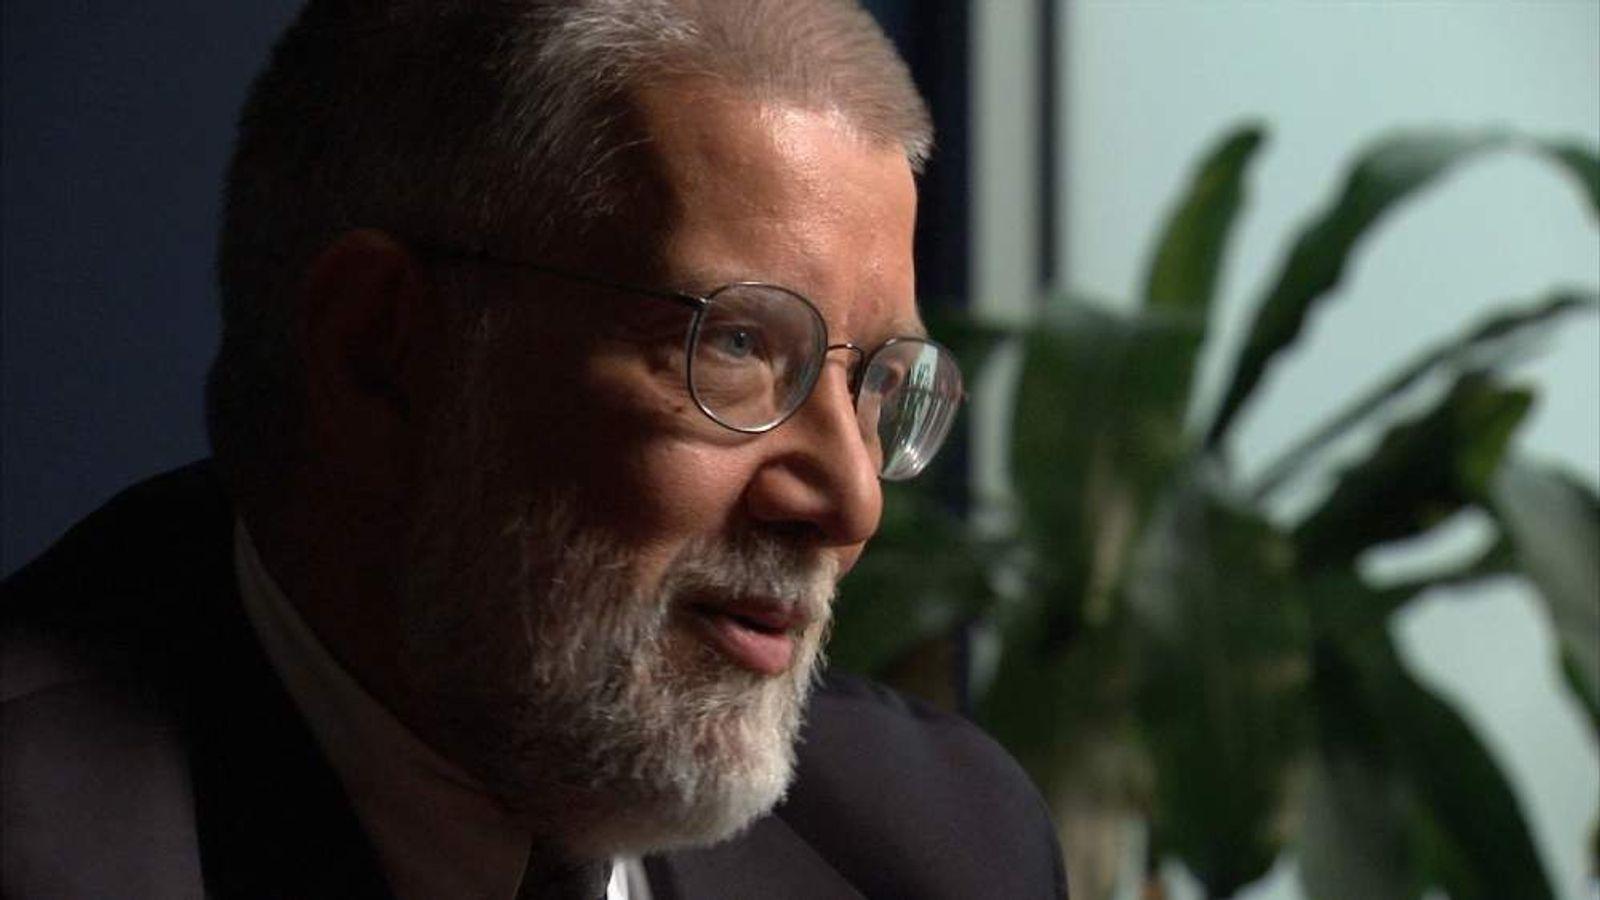 Former Senior CIA Officer Michael Scheuer